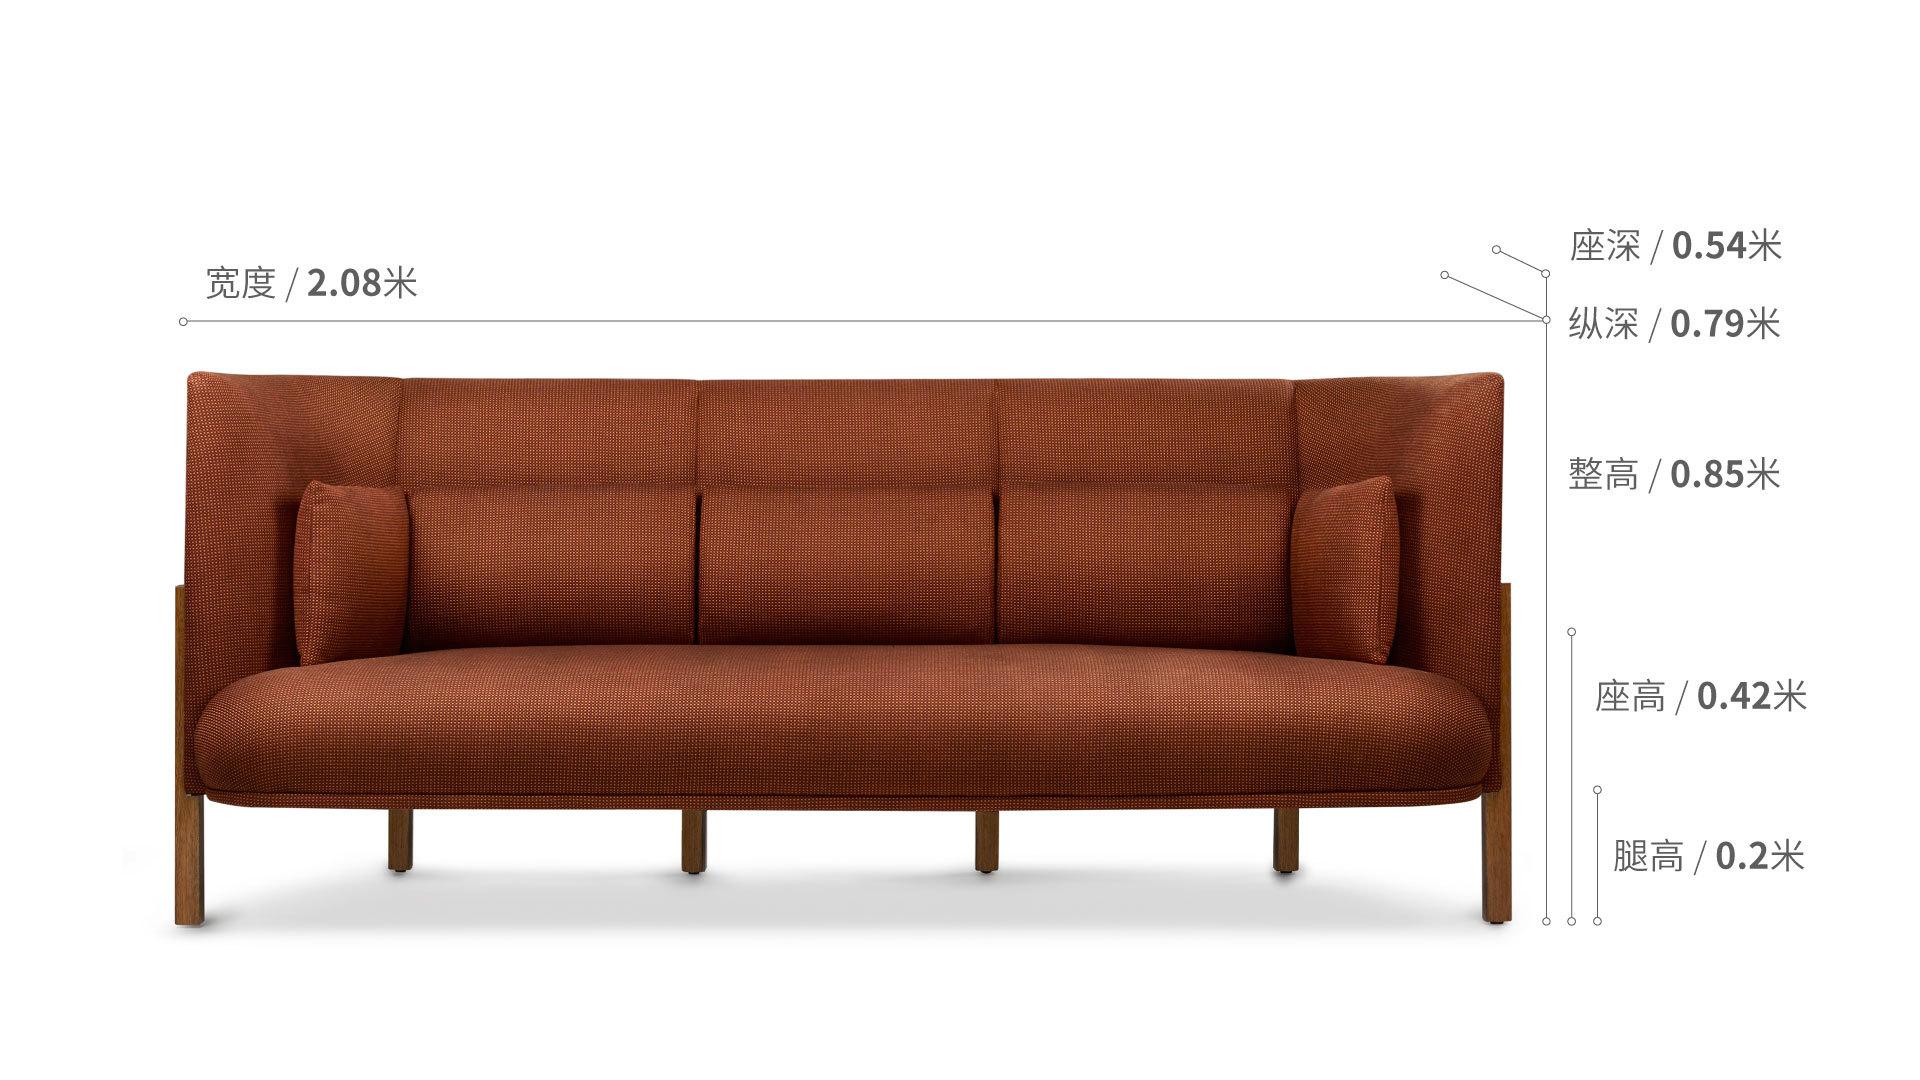 COFA三人座沙发效果图